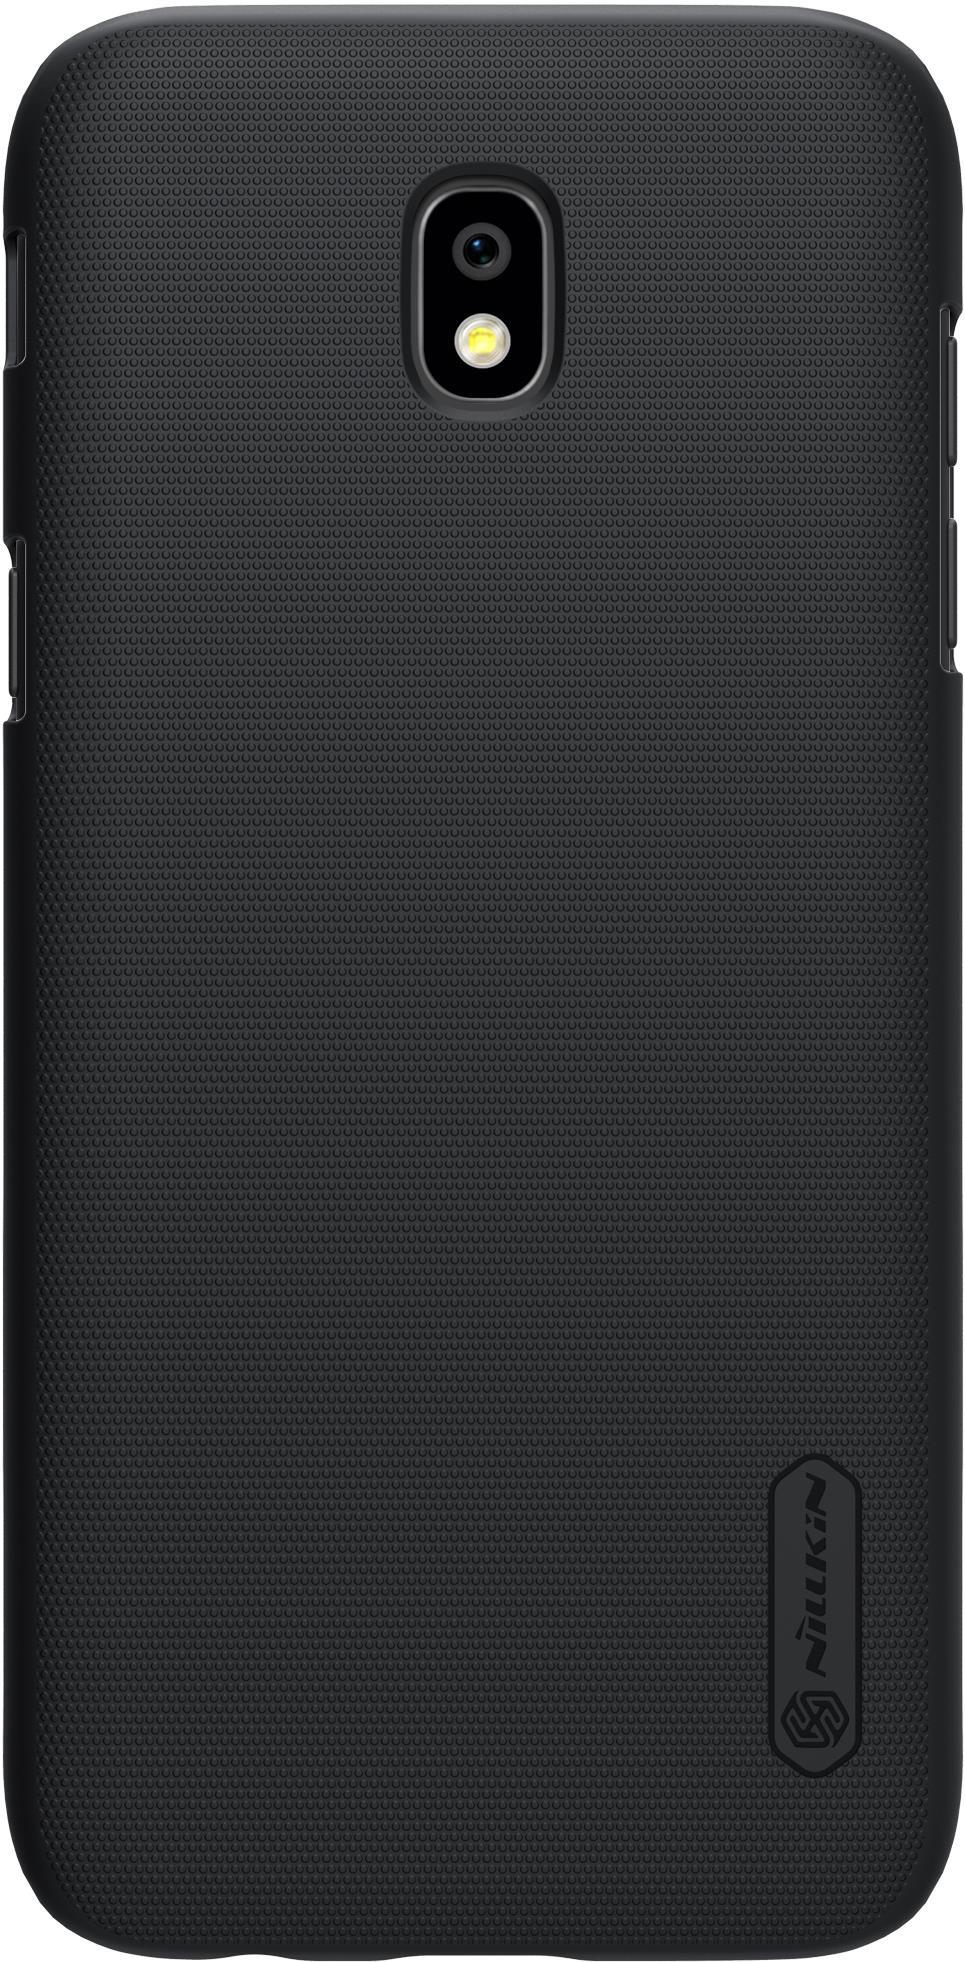 Накладка Nillkin Super Frosted для Samsung Galaxy J5 (2017), 6902048143746, черный